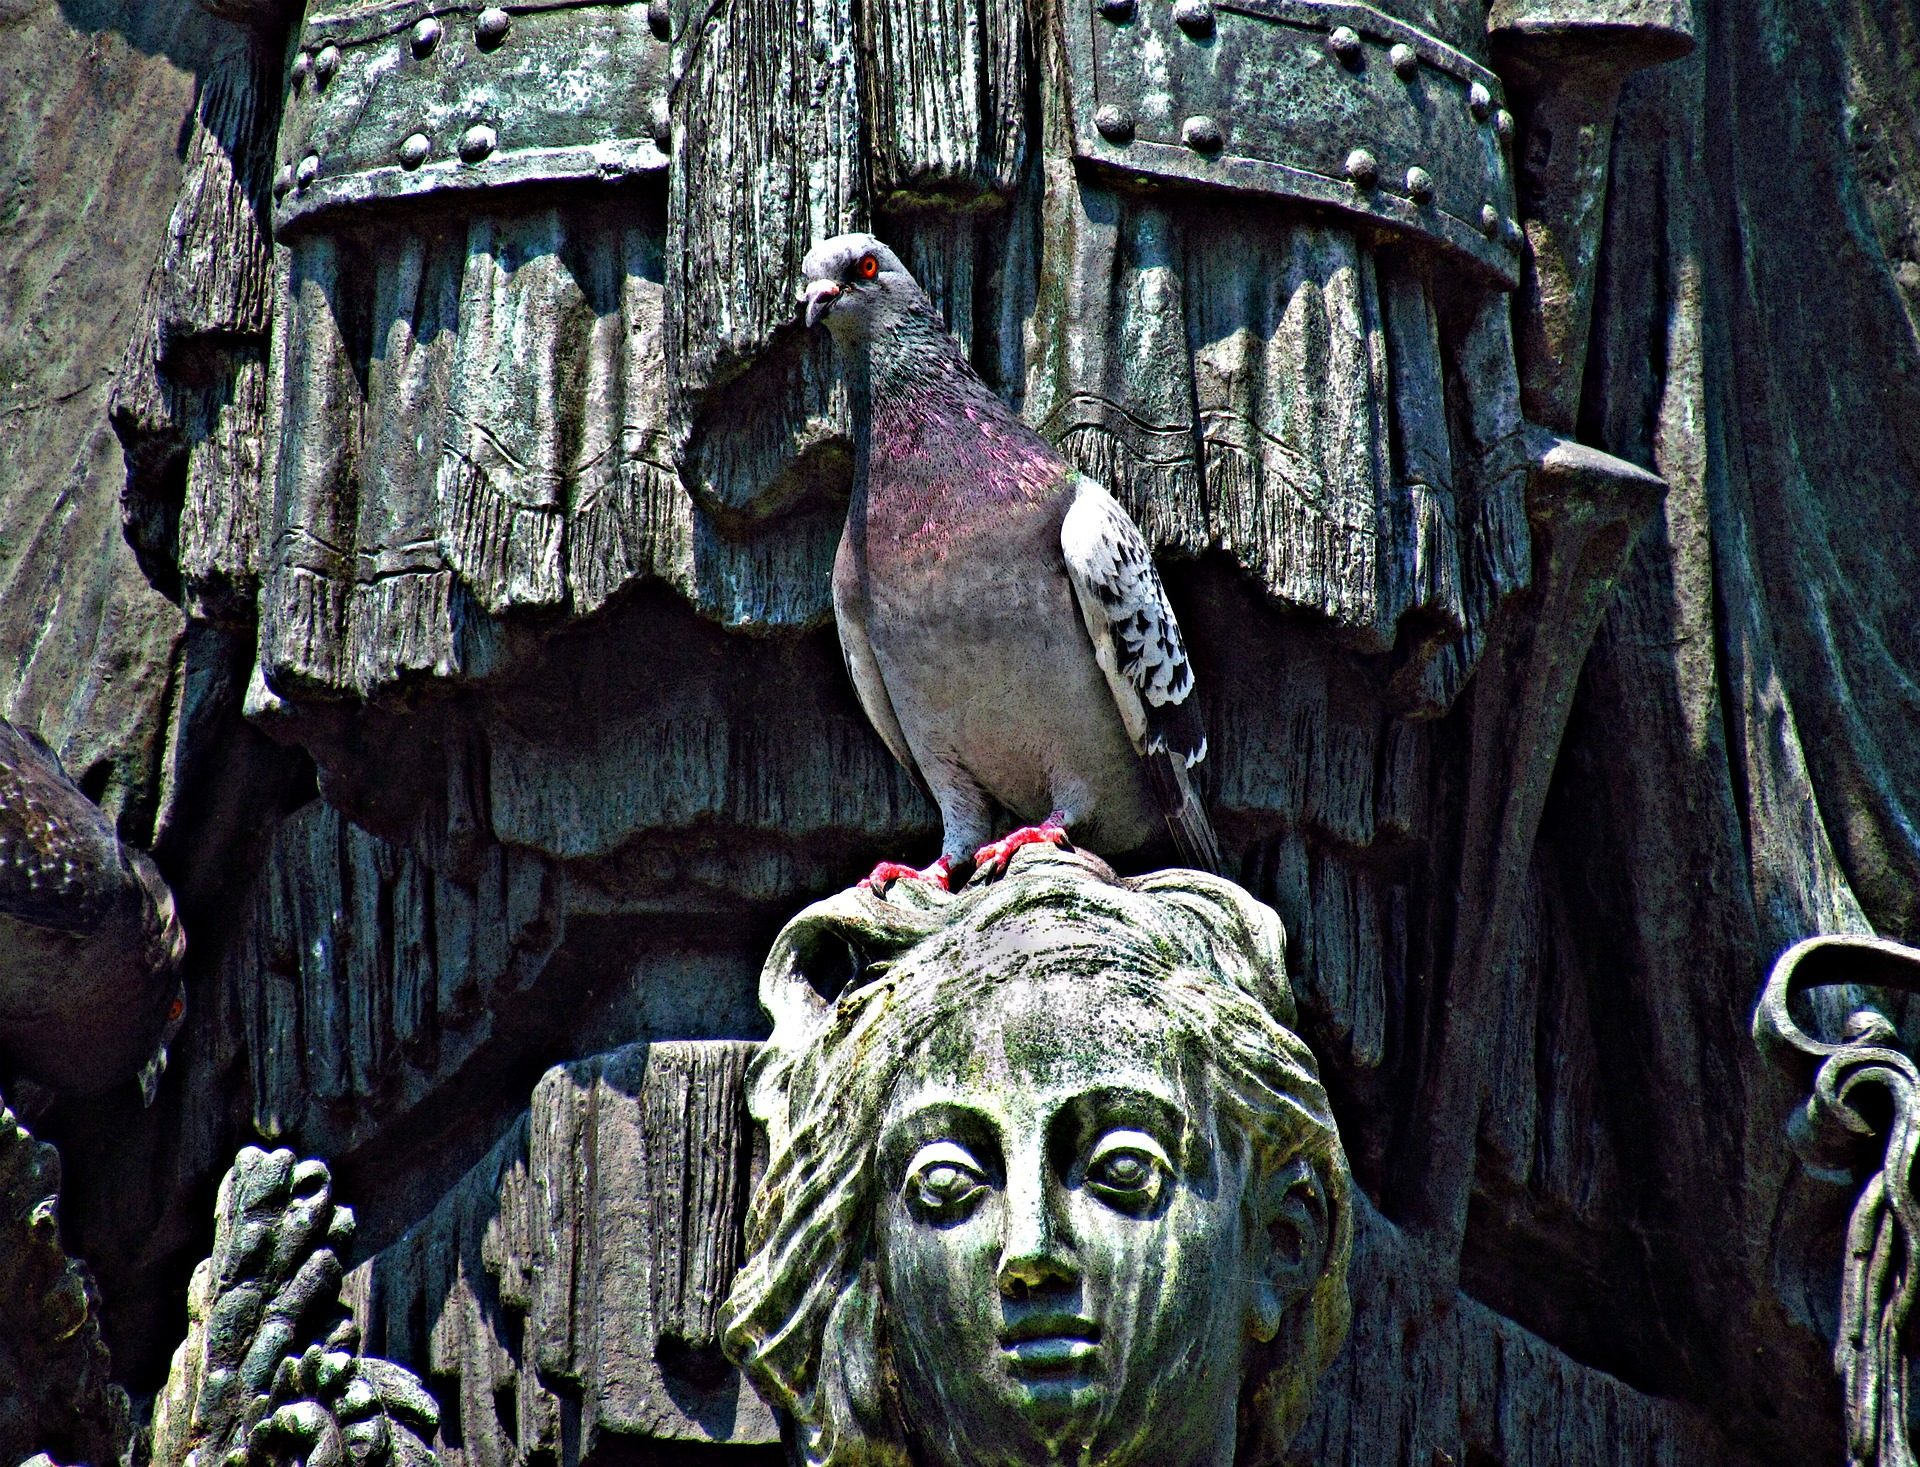 पालोमा, Ave, पक्षी, मूर्तिकला, स्मारक - HD वॉलपेपर - प्रोफेसर-falken.com